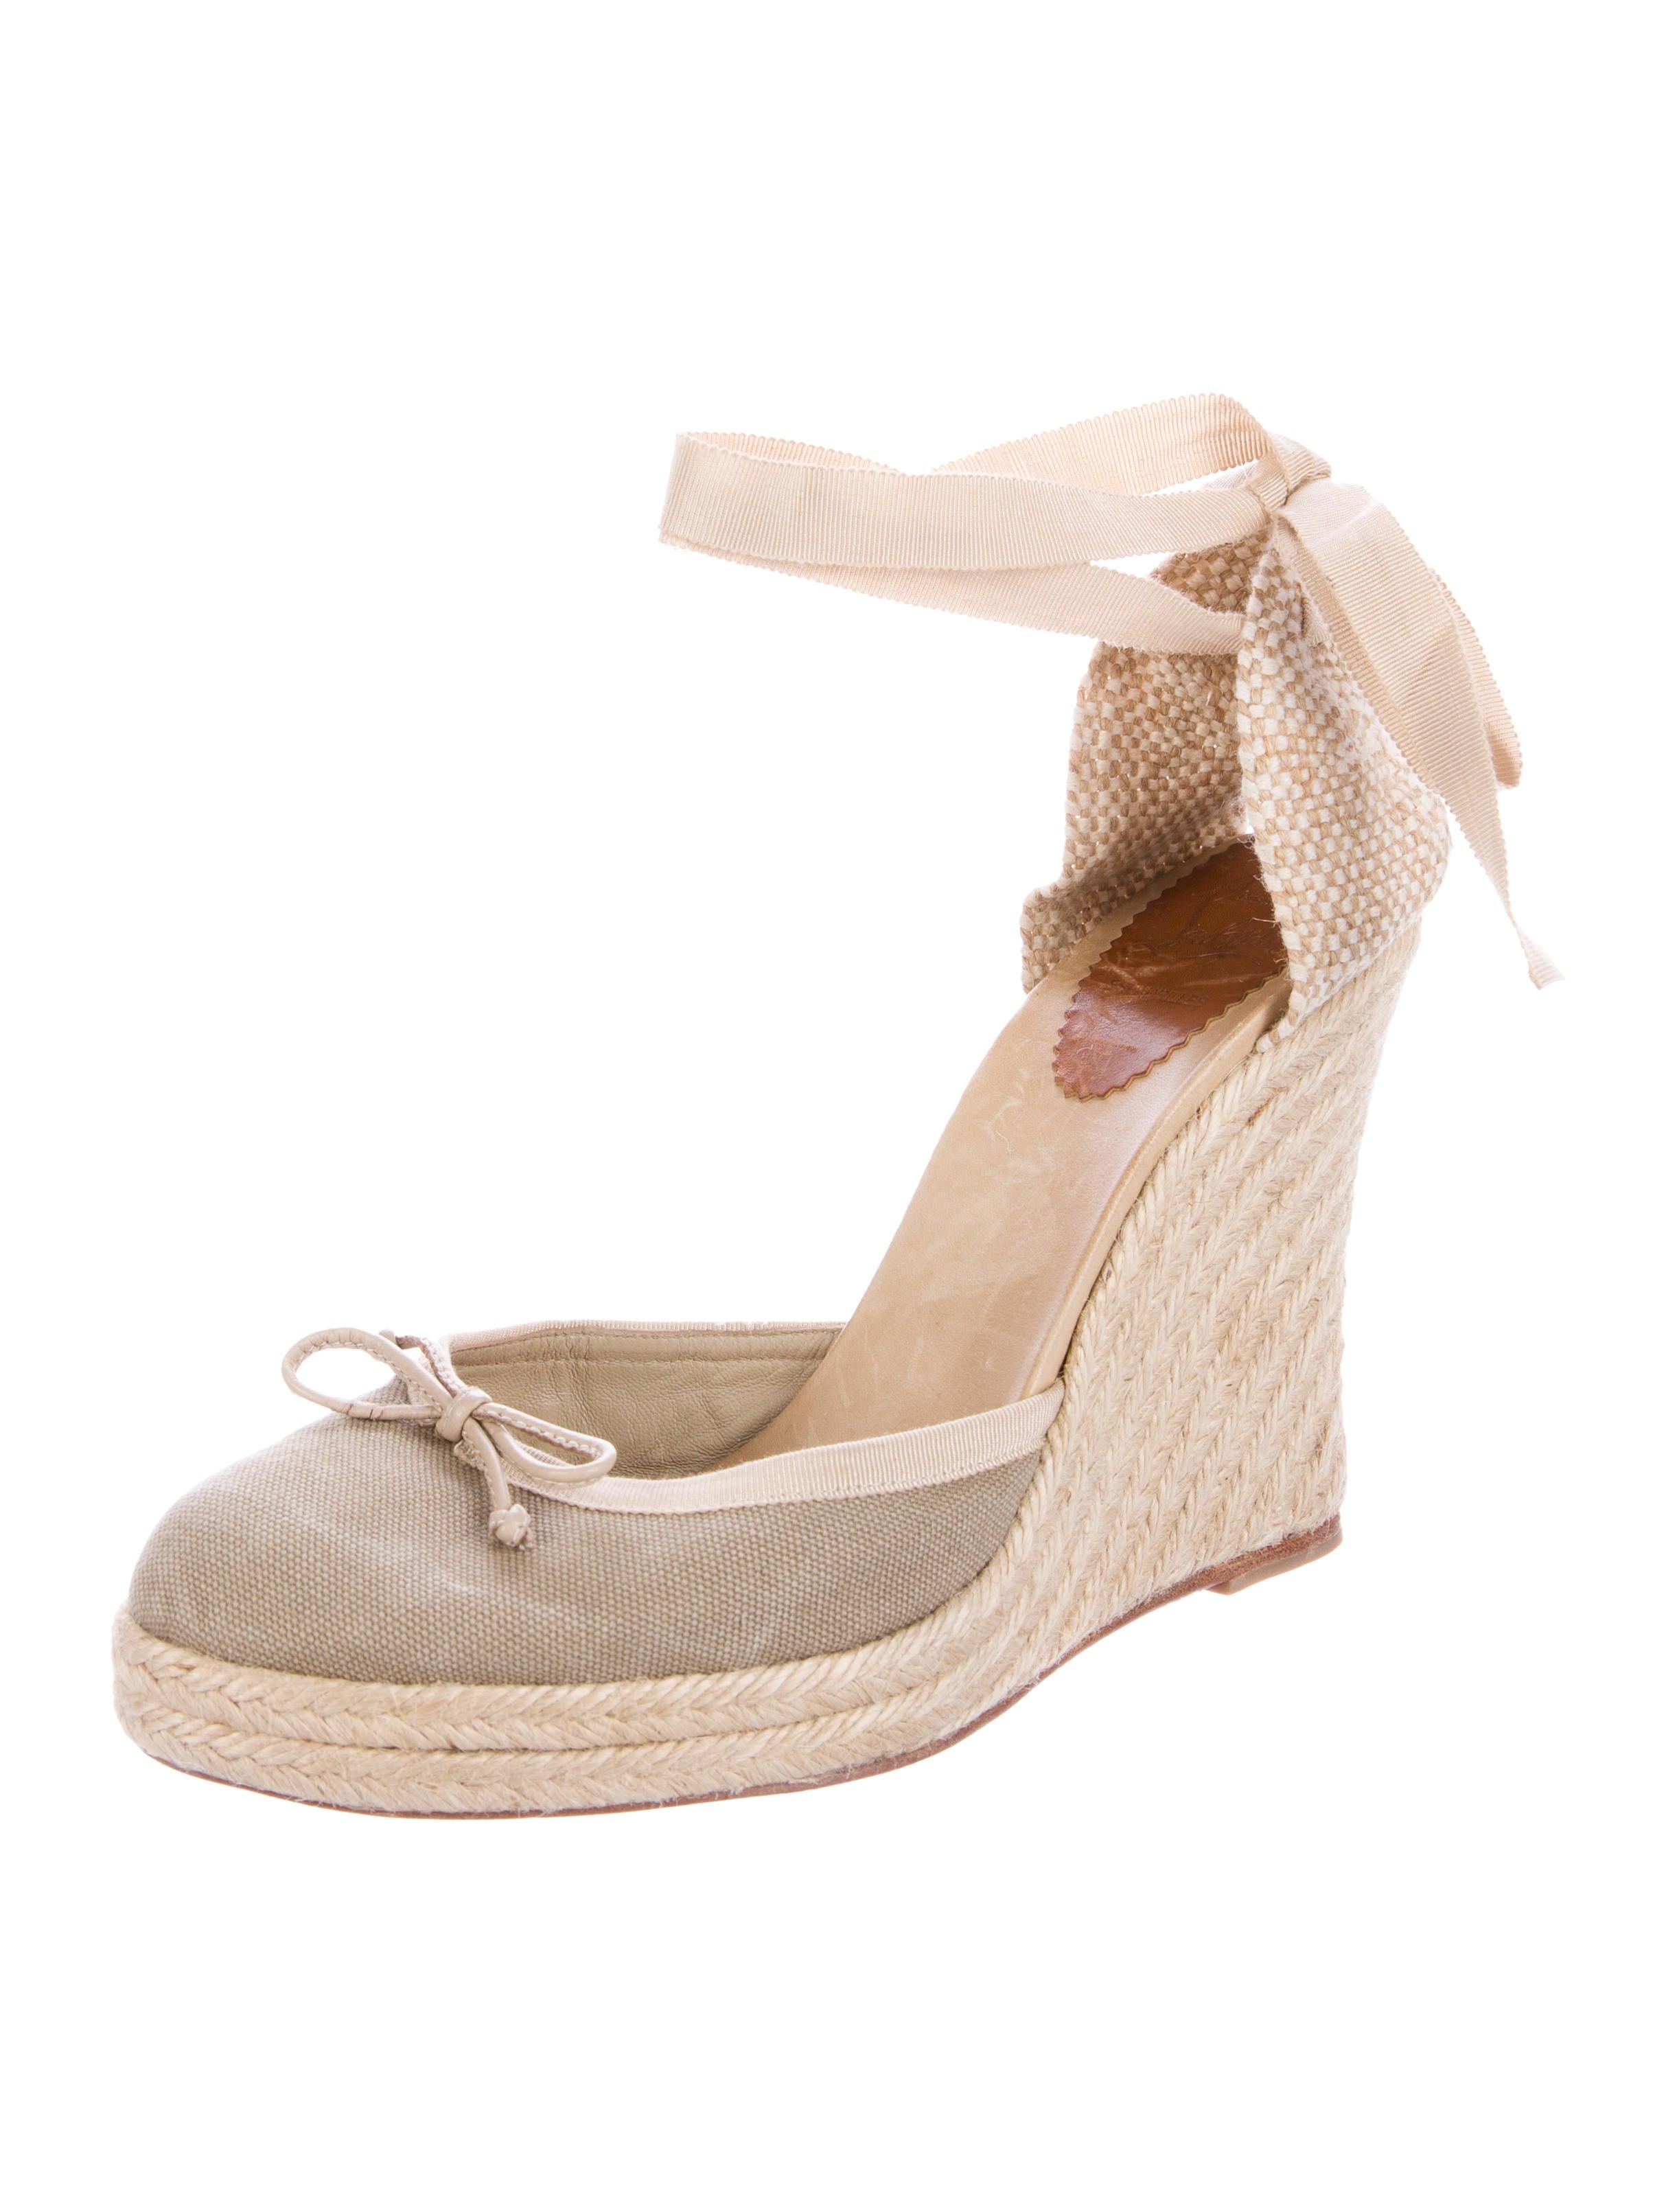 christian louboutin canvas espadrille wedges shoes